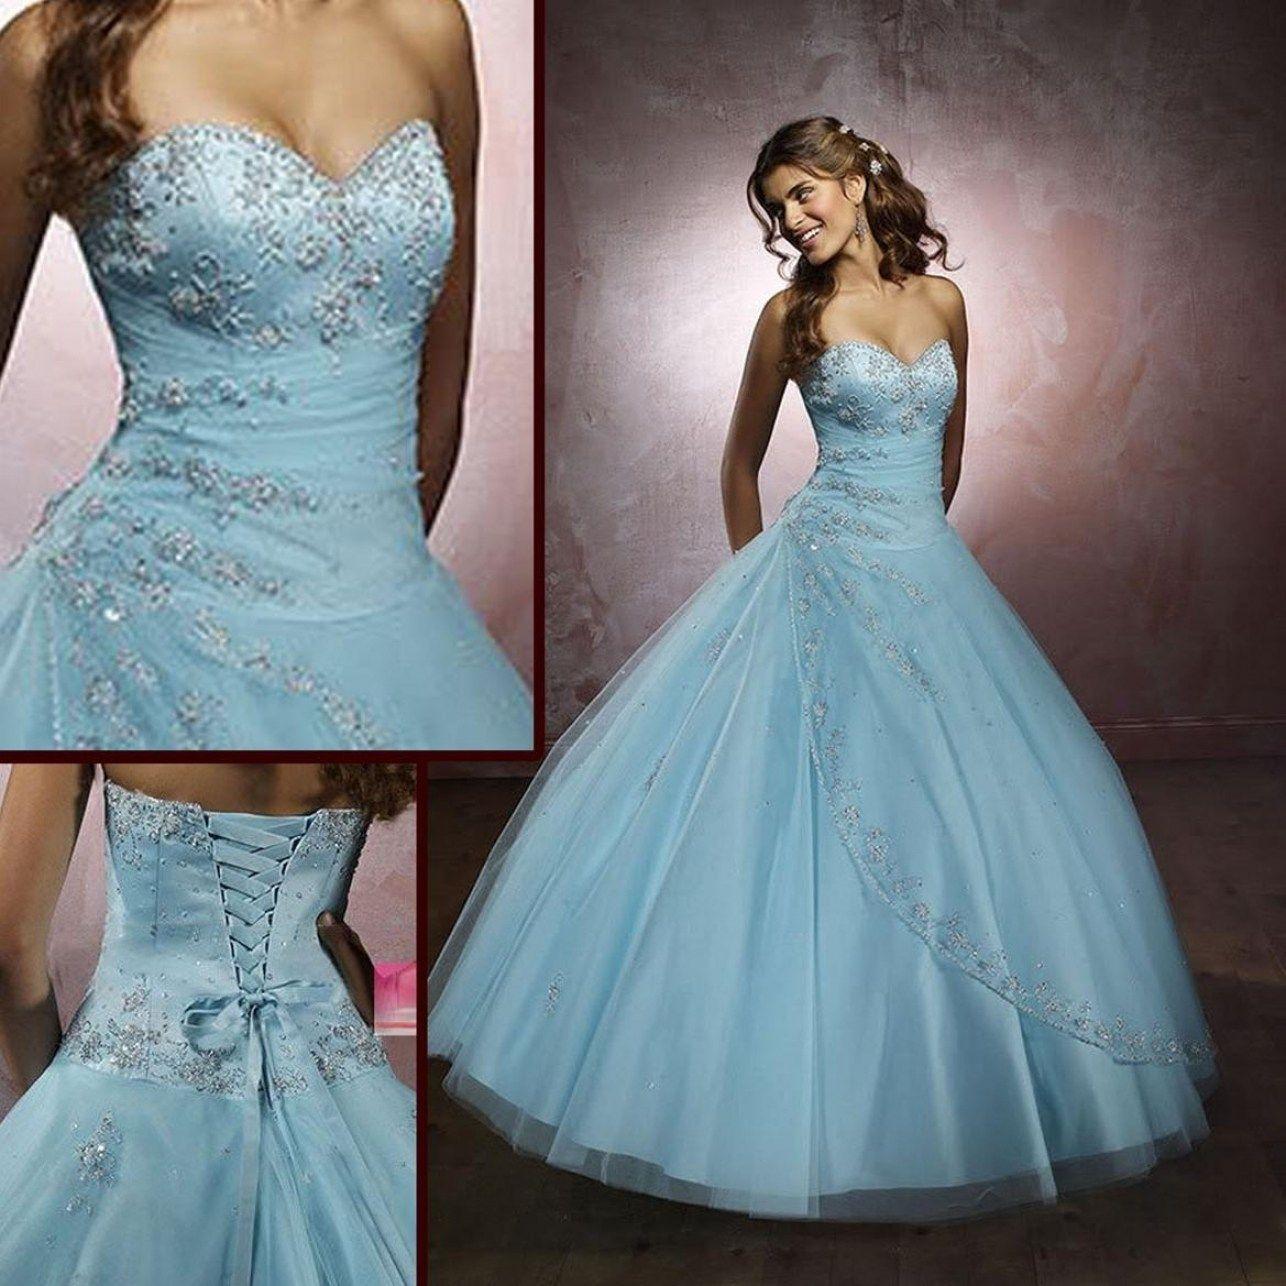 34 Beautiful Light Blue And White Wedding Dresses Best Inspiration Popular Wedding Dresses Baby Blue Wedding Dresses Plus Size Wedding Guest Dresses